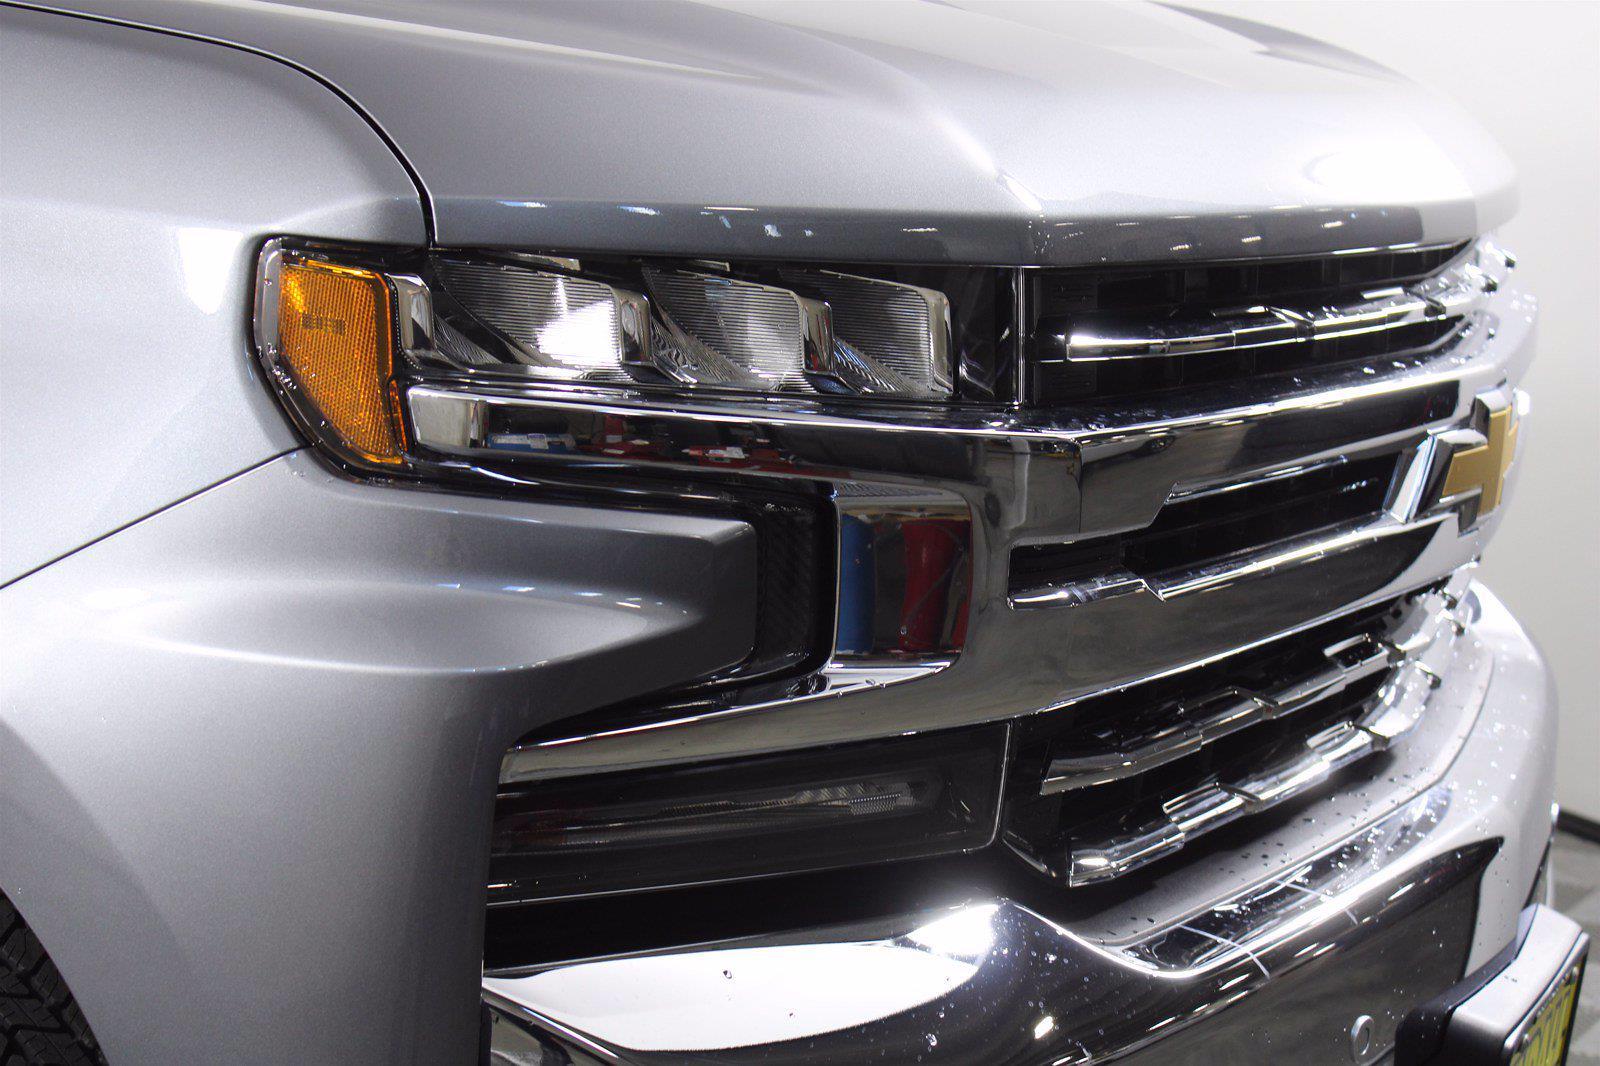 2021 Chevrolet Silverado 1500 Crew Cab 4x4, Pickup #D110776 - photo 3